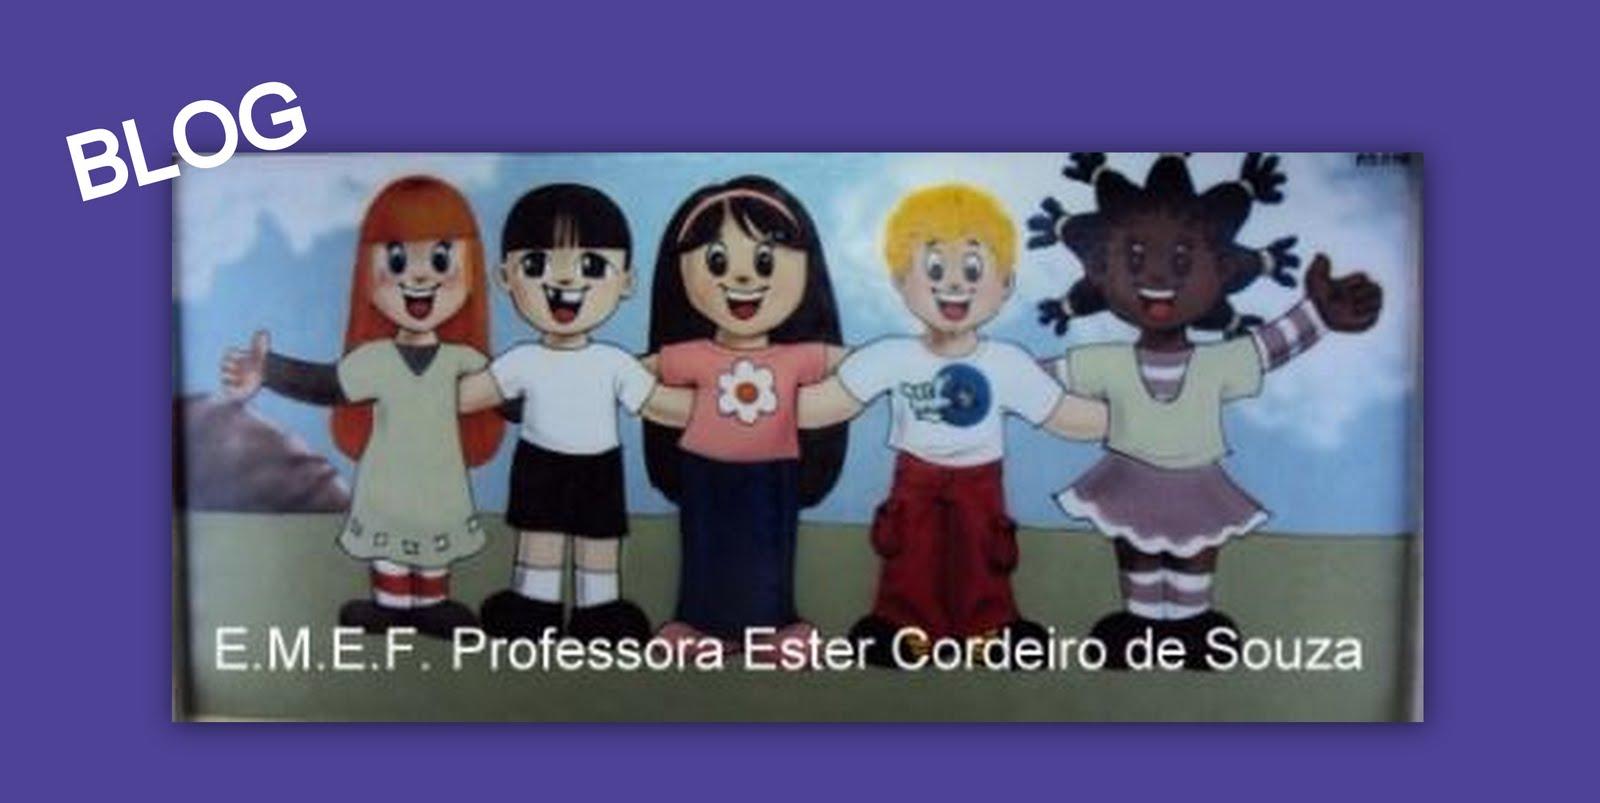 EMEF Profª Ester Cordeiro de Souza